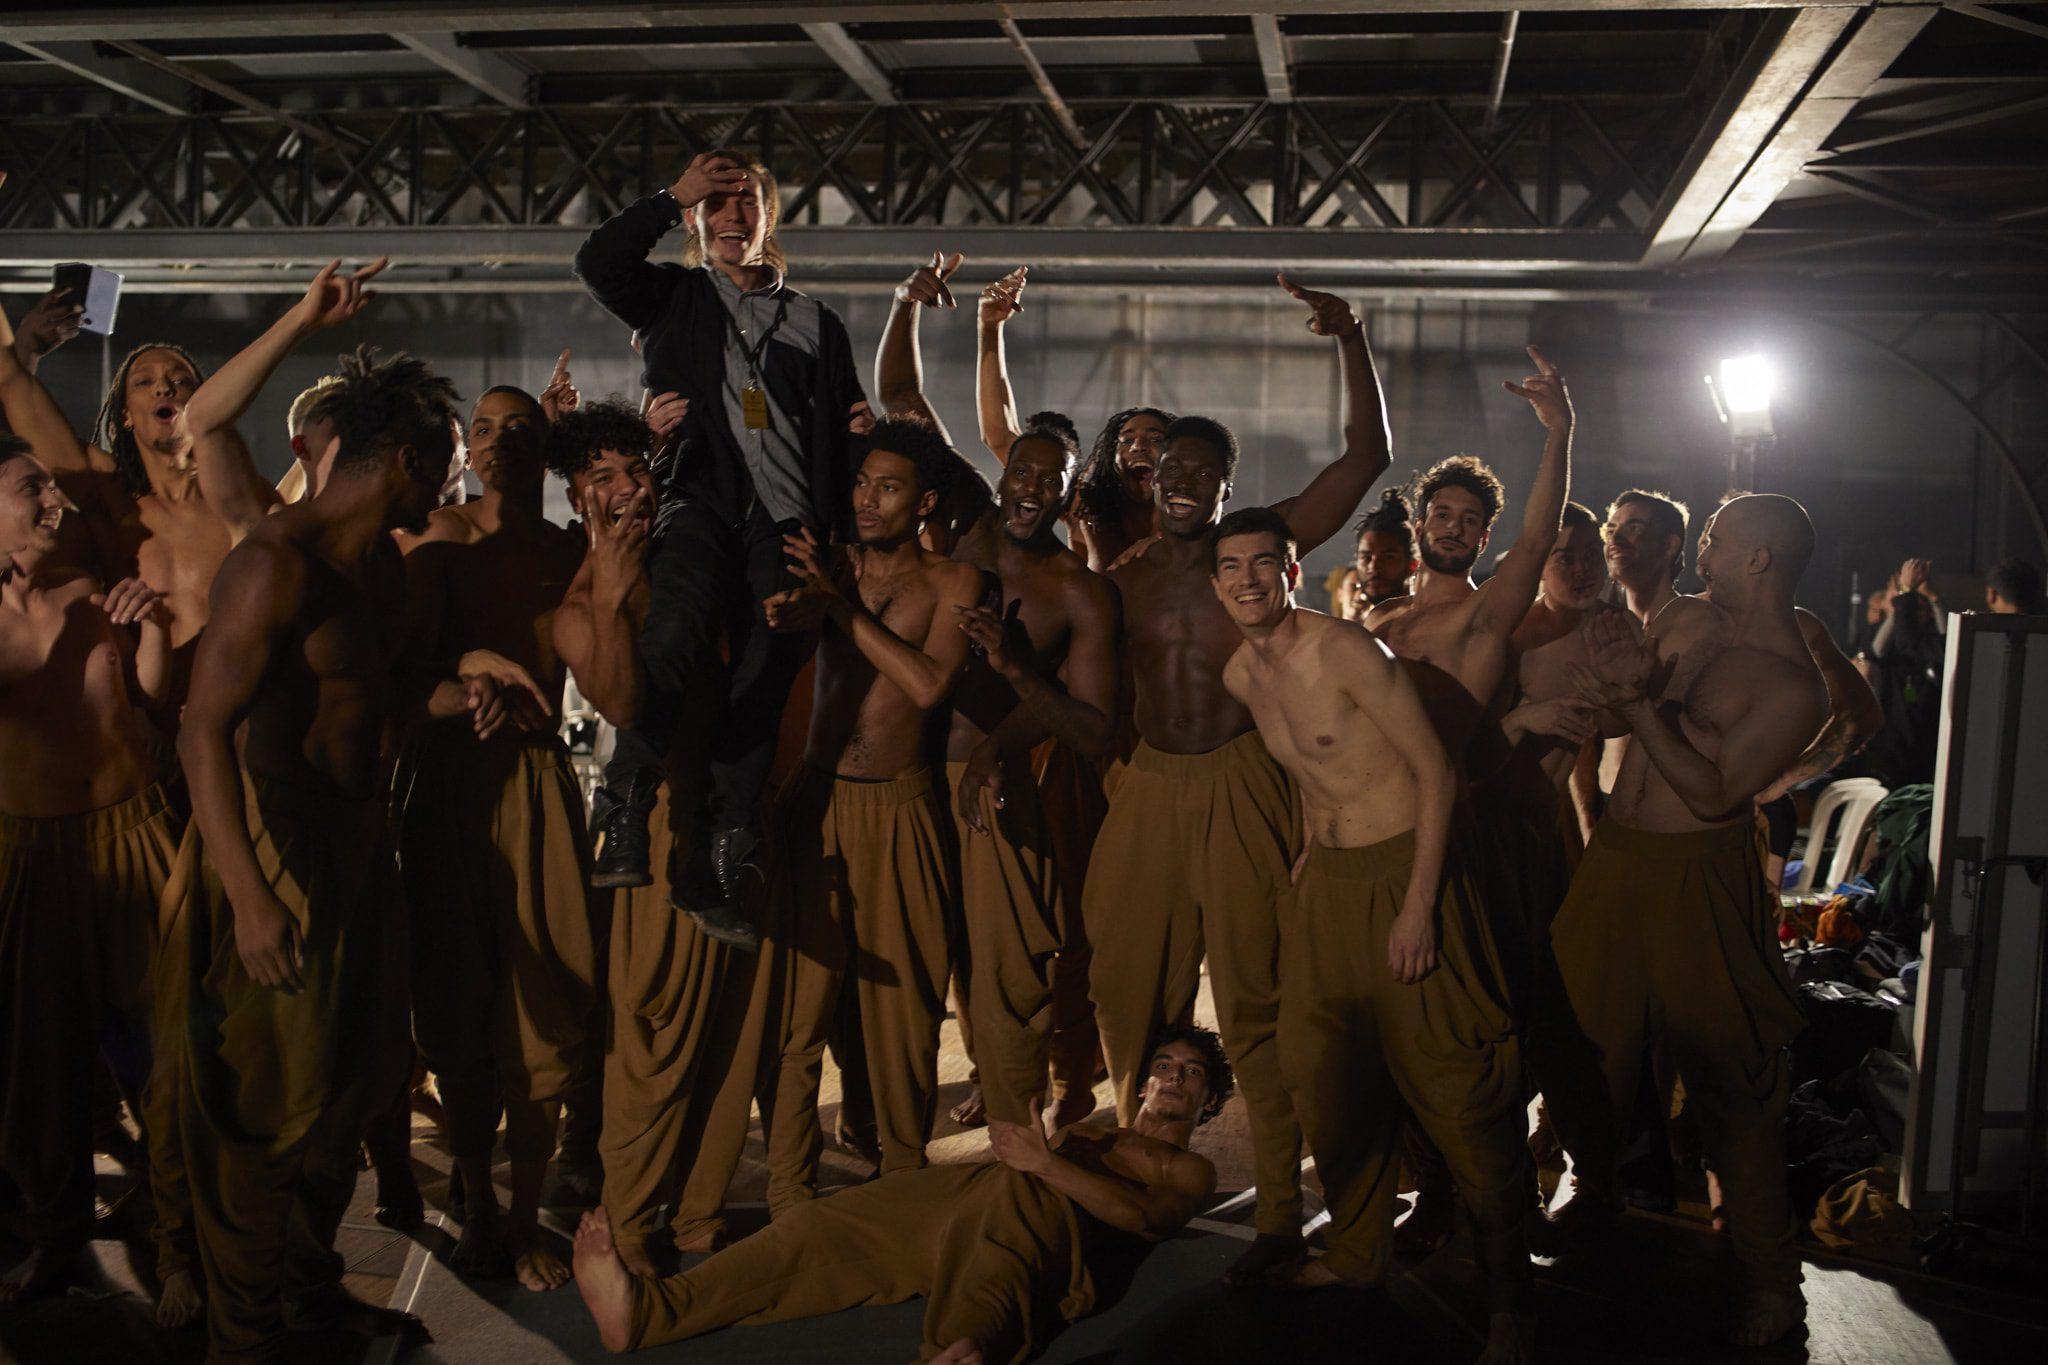 Dancers backstage at the Balmain men's fall 2020 show. Photo: Francisco Gomez de Villaboa/WWD